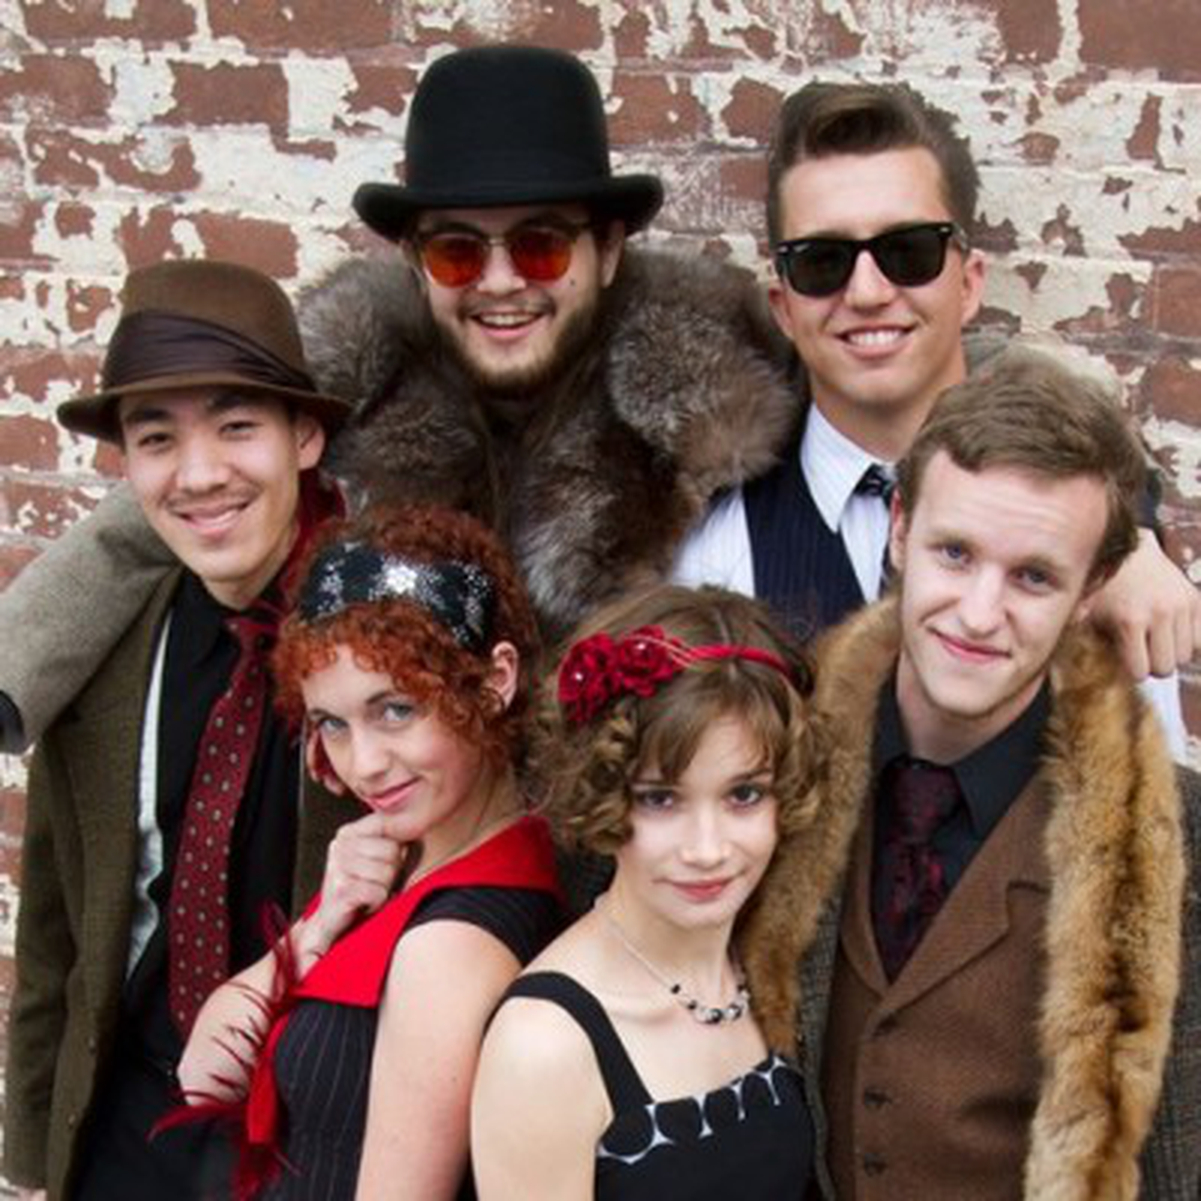 RedSkunk Band